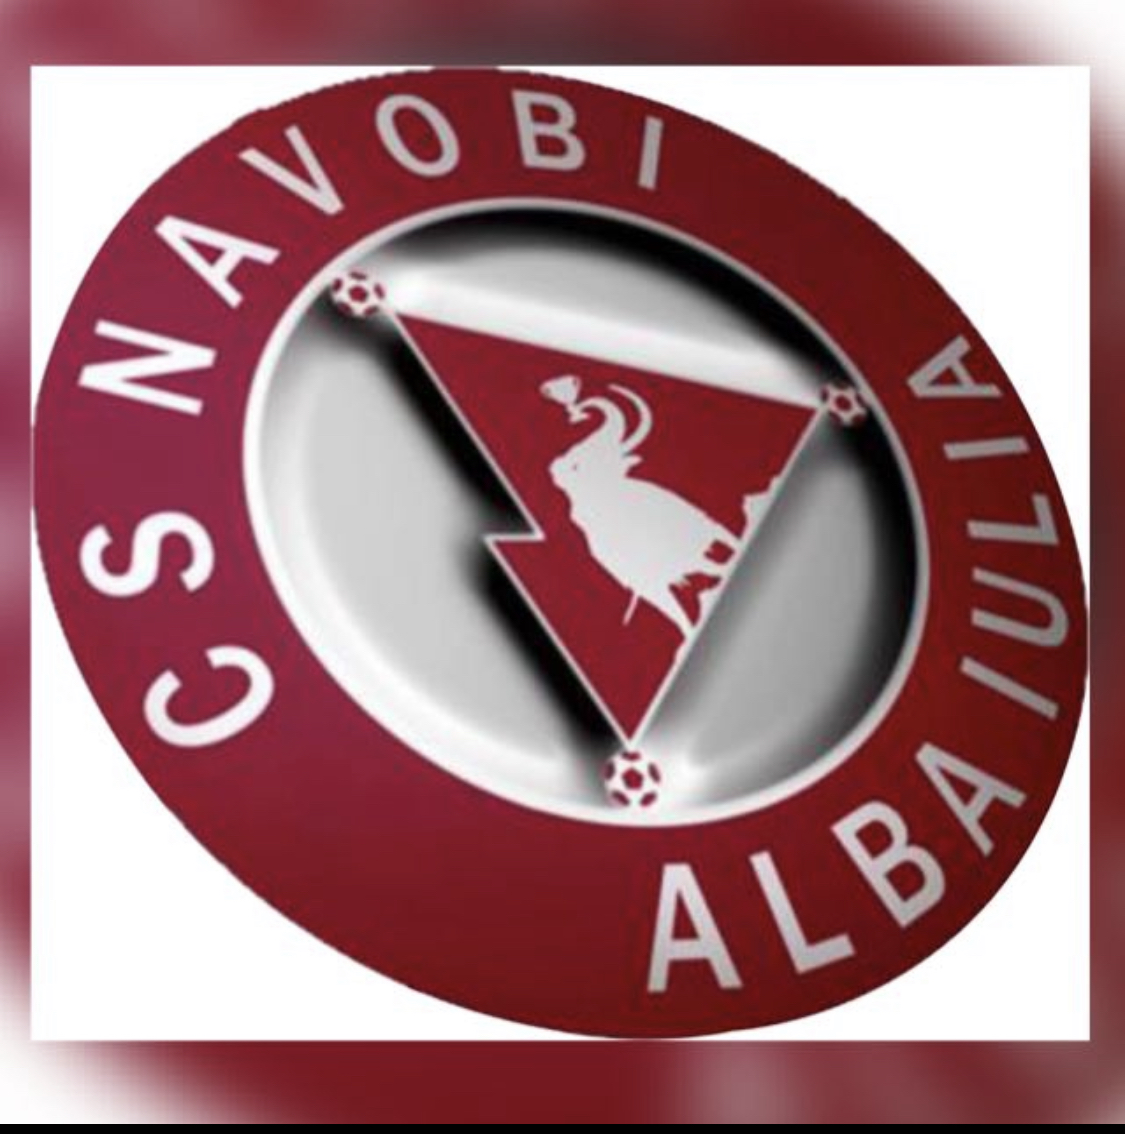 "Asociatia ""Clubul Sportiv Navobi Alba Iulia"" logo"